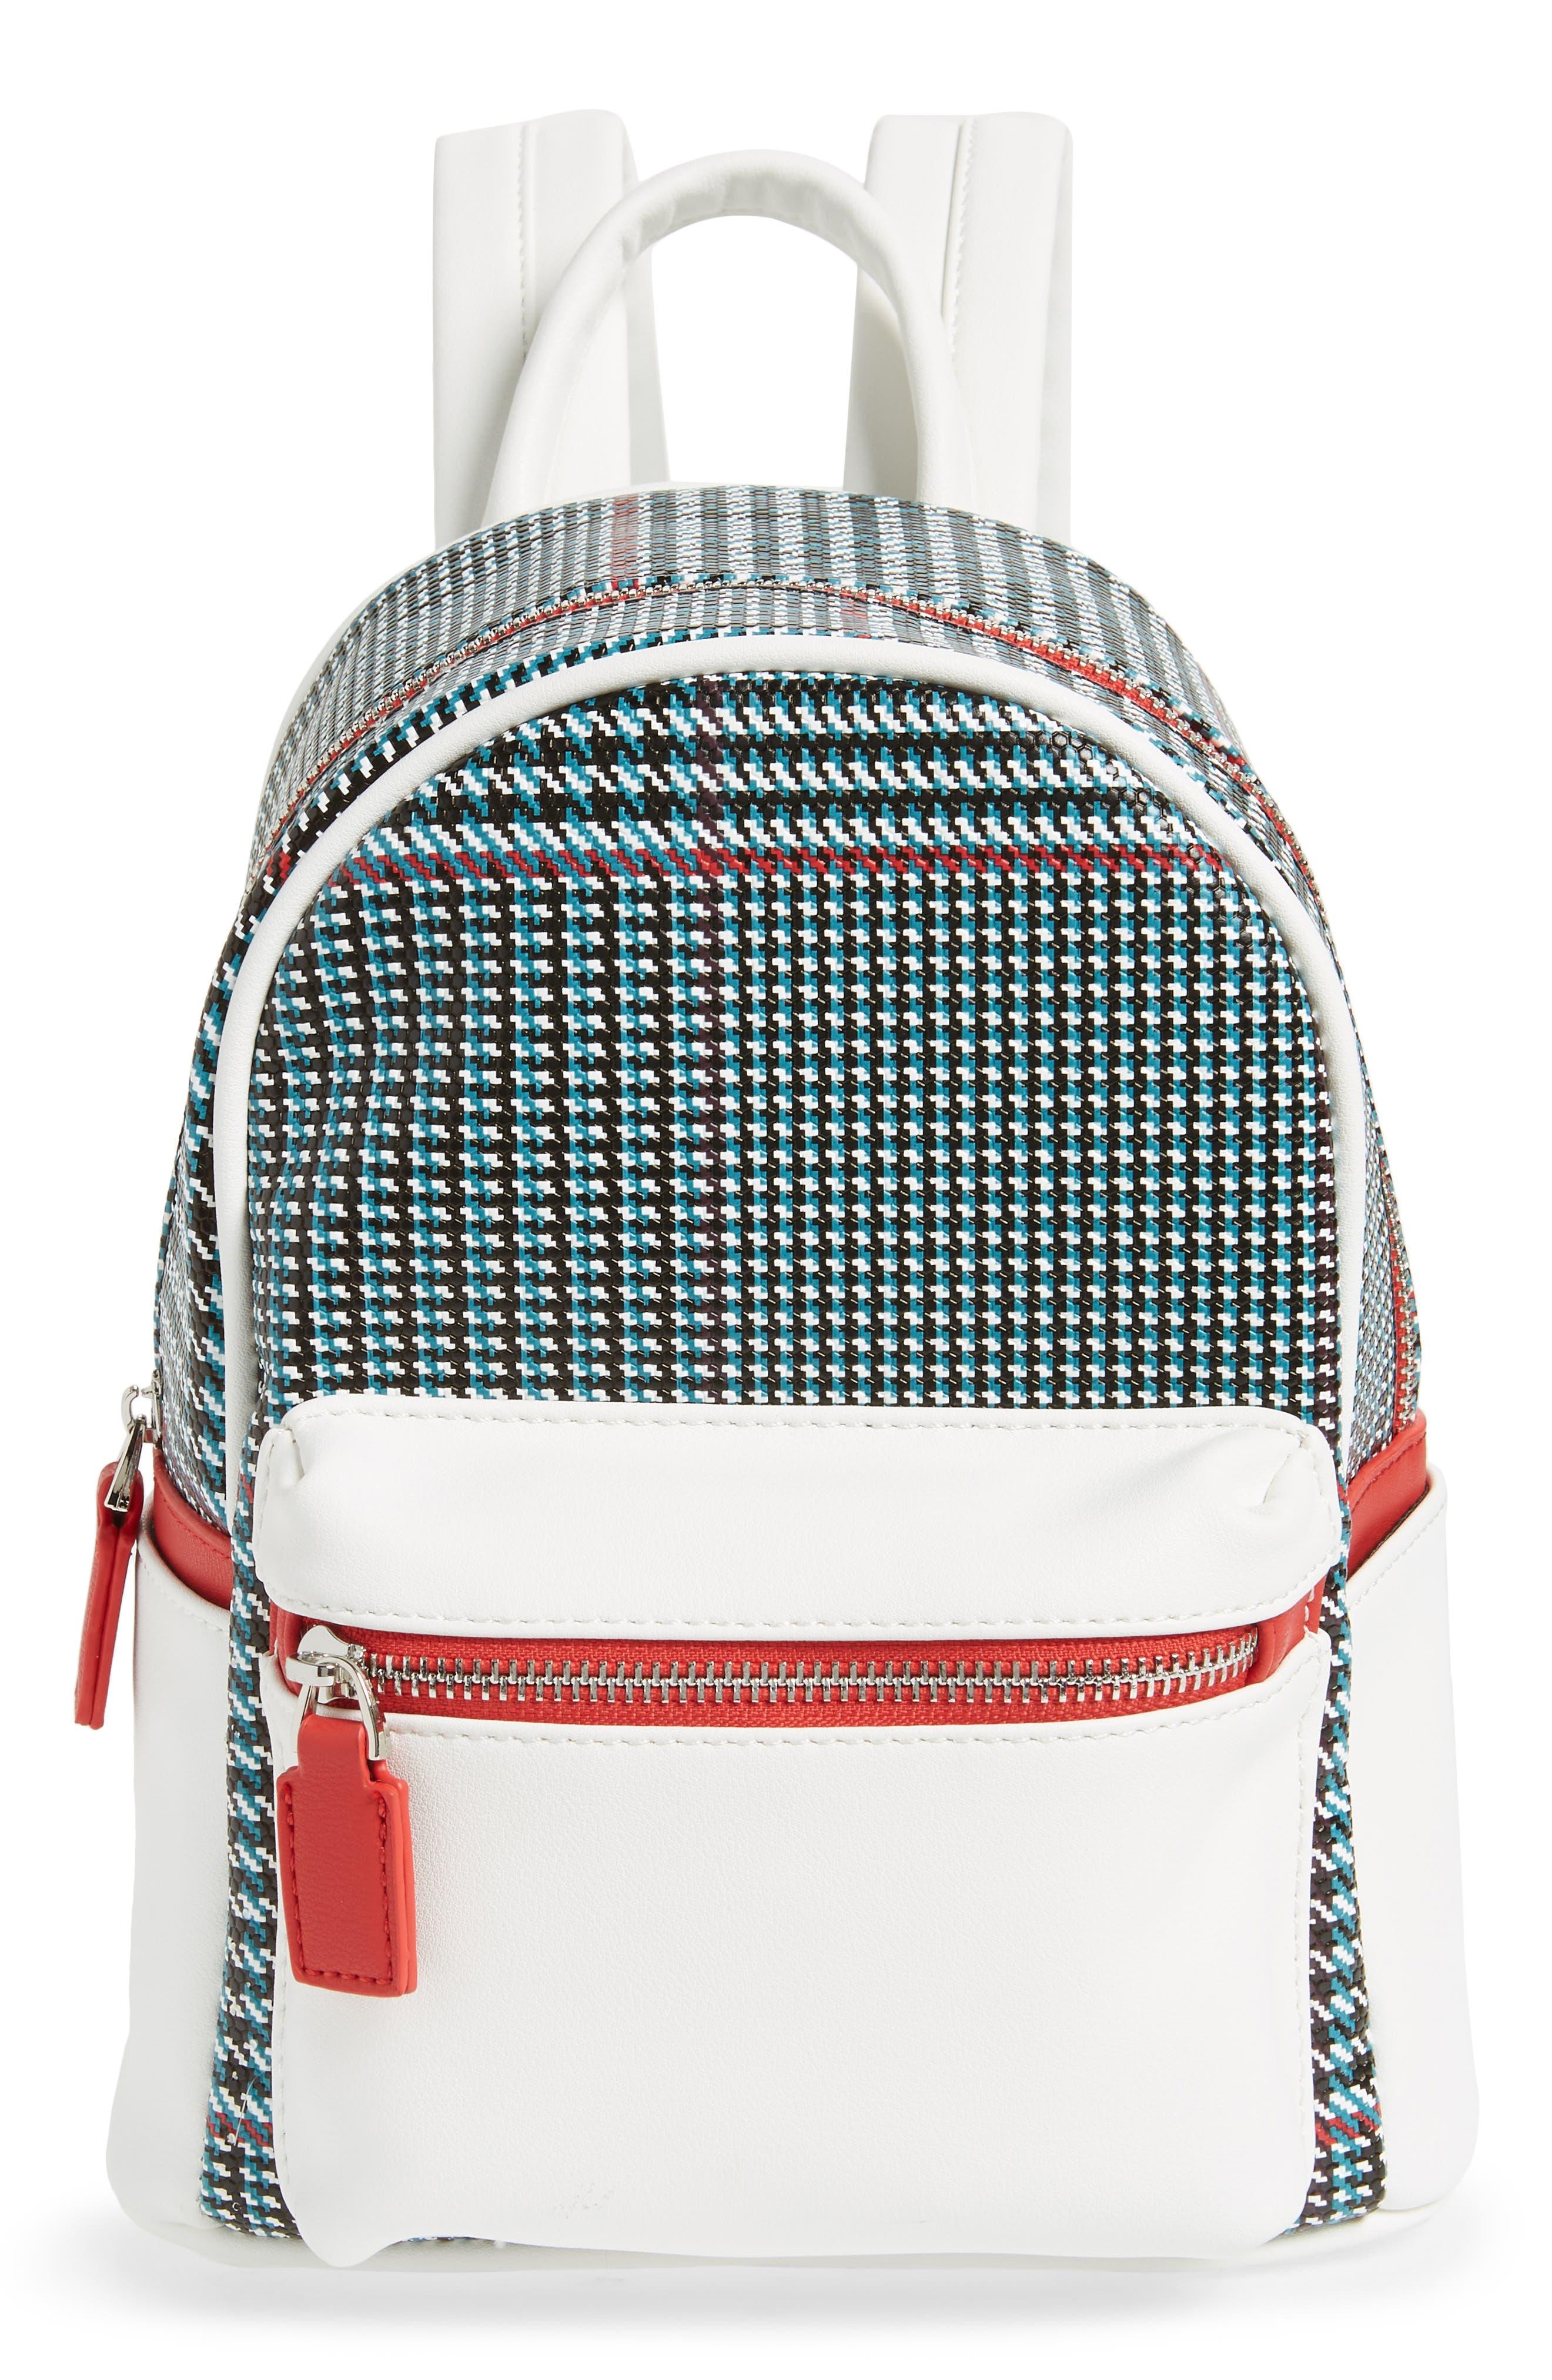 Woven Mini Backpack,                         Main,                         color, BLUE MULTI